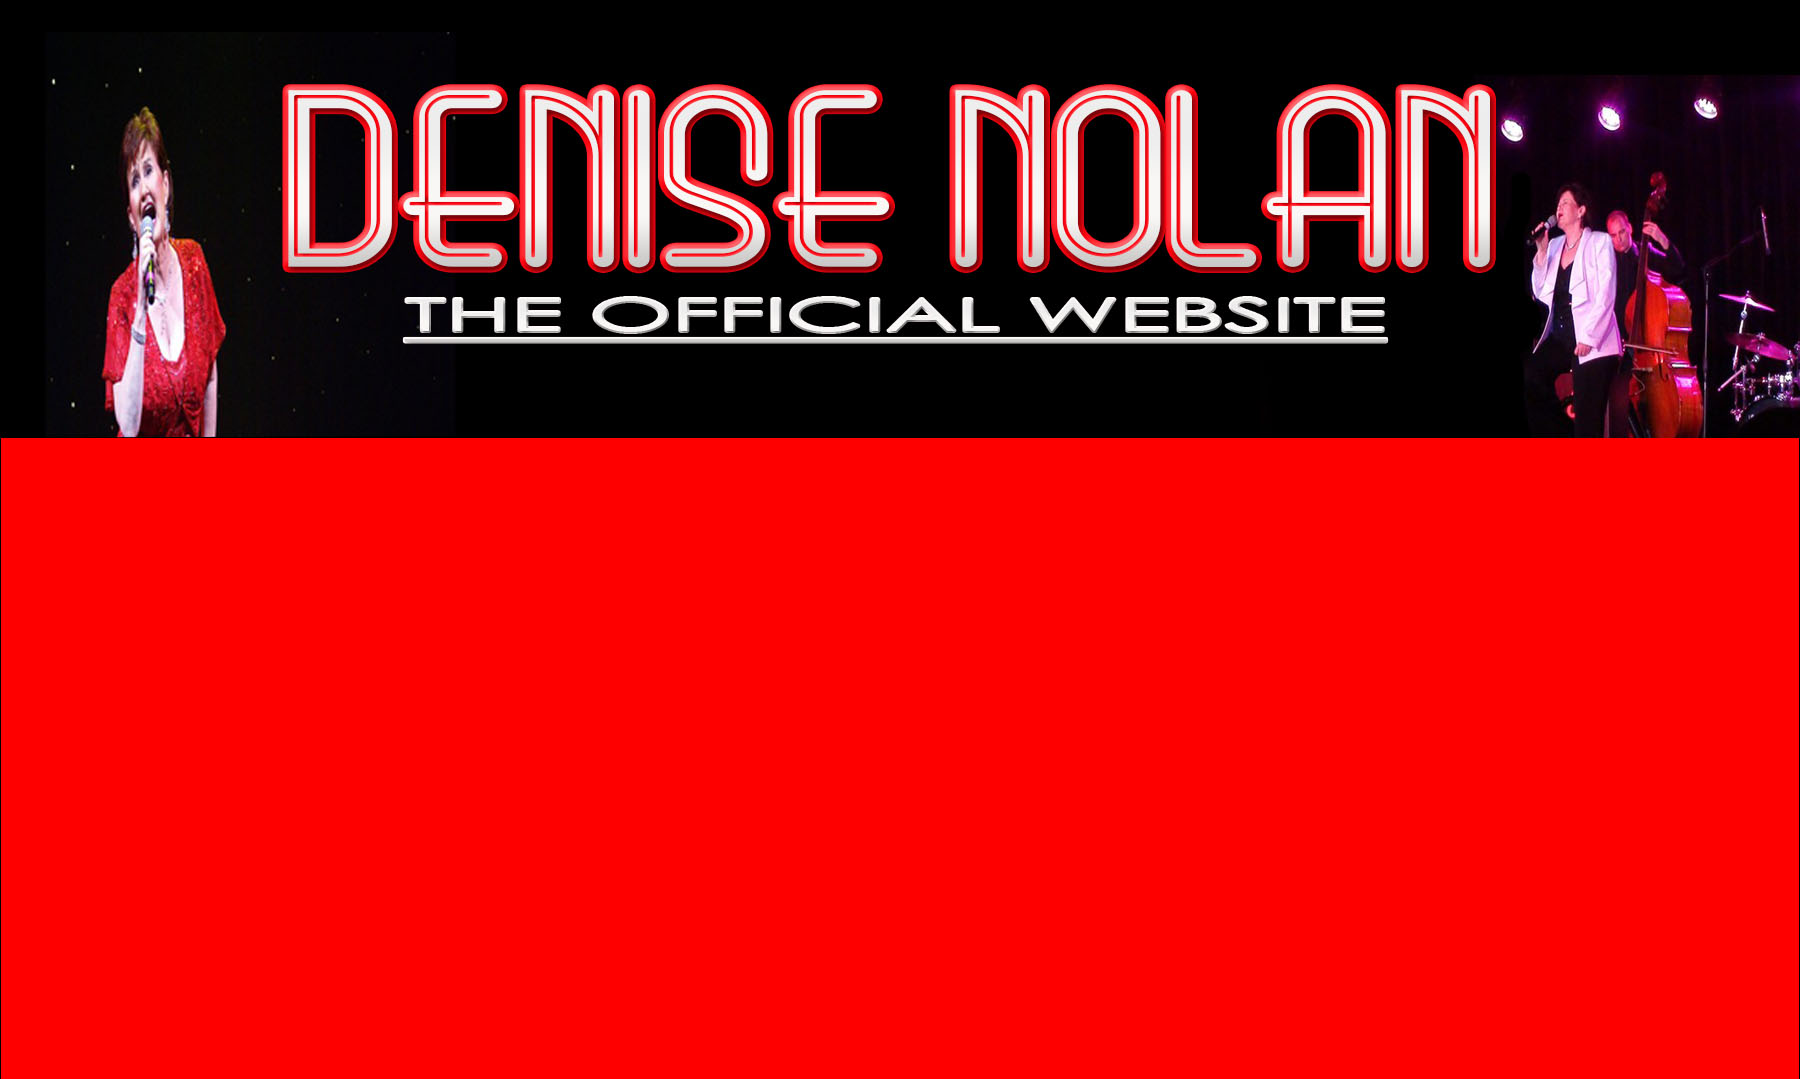 BERNIE NOLAN - Denise Nolan - The Official Website